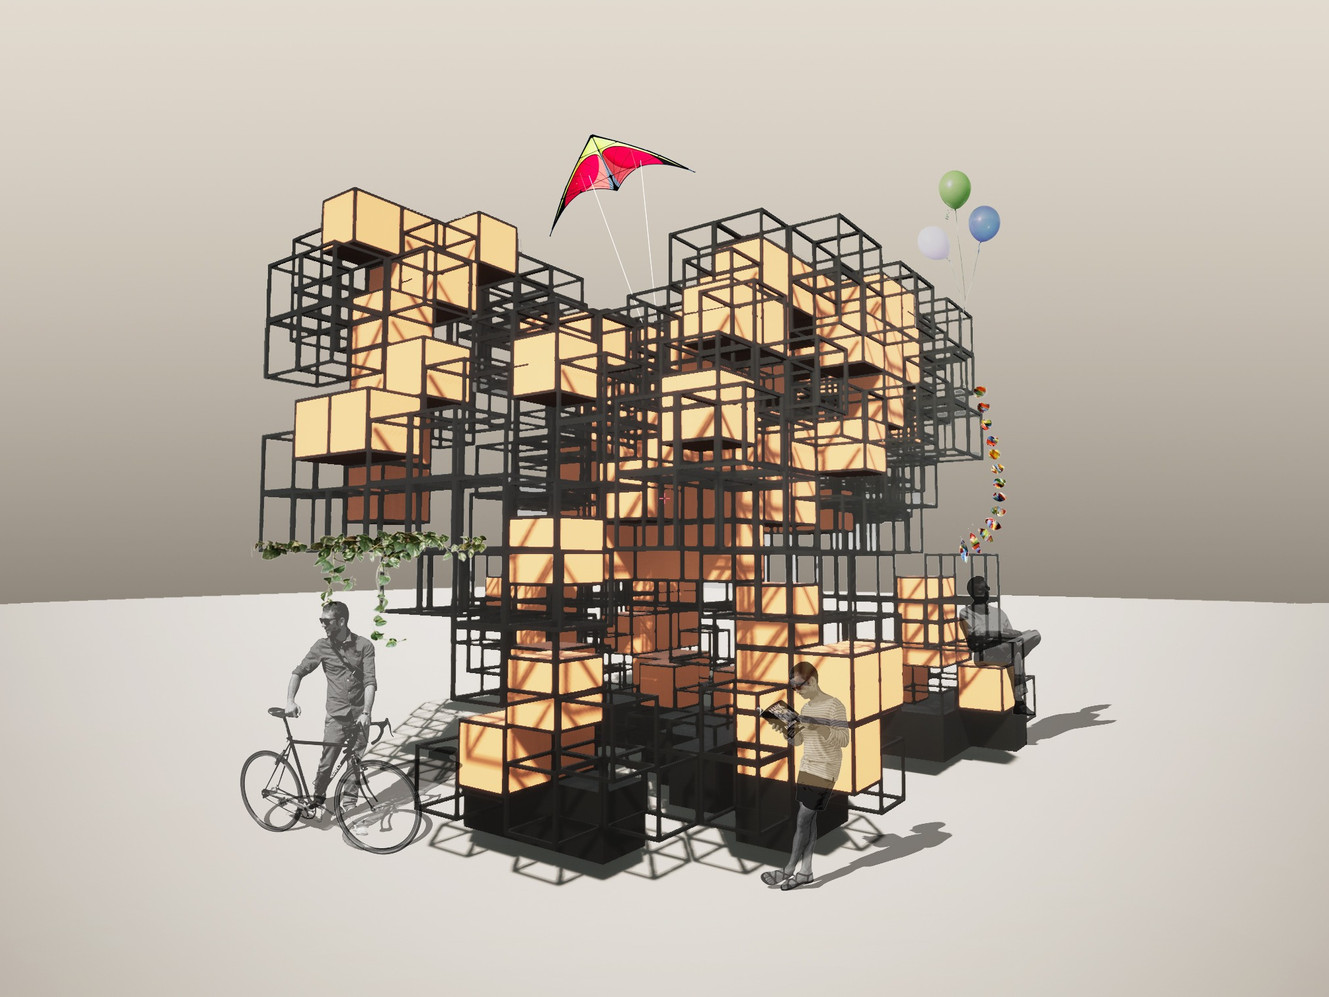 Cellular Automata Pavilion